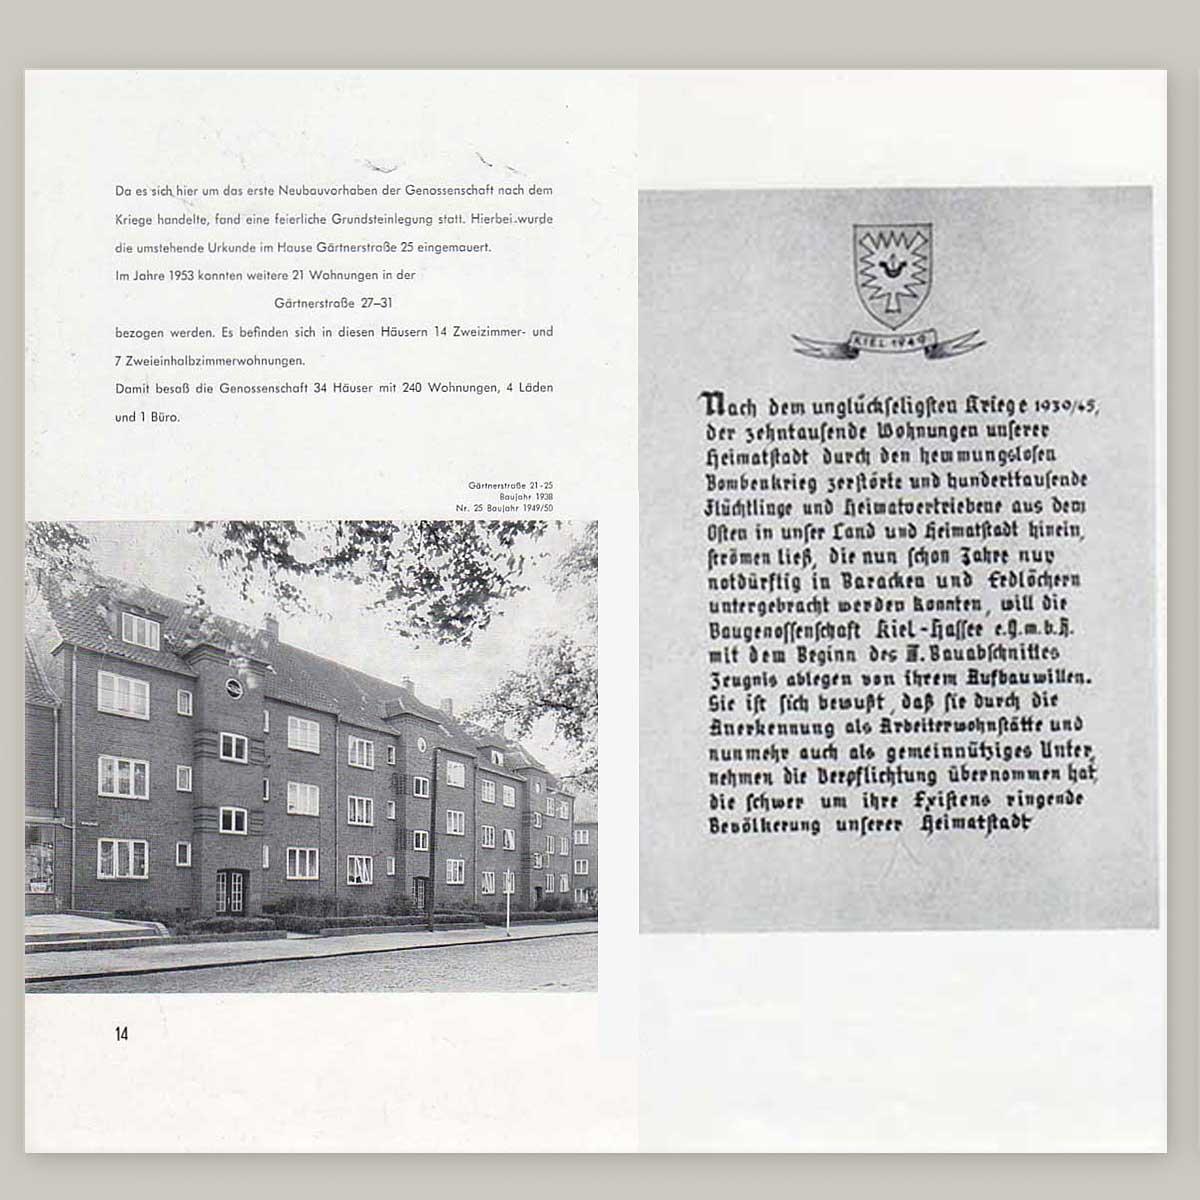 Jubiläumsschrift 25 Jahre Baugenossenschaft Kiel Hassee